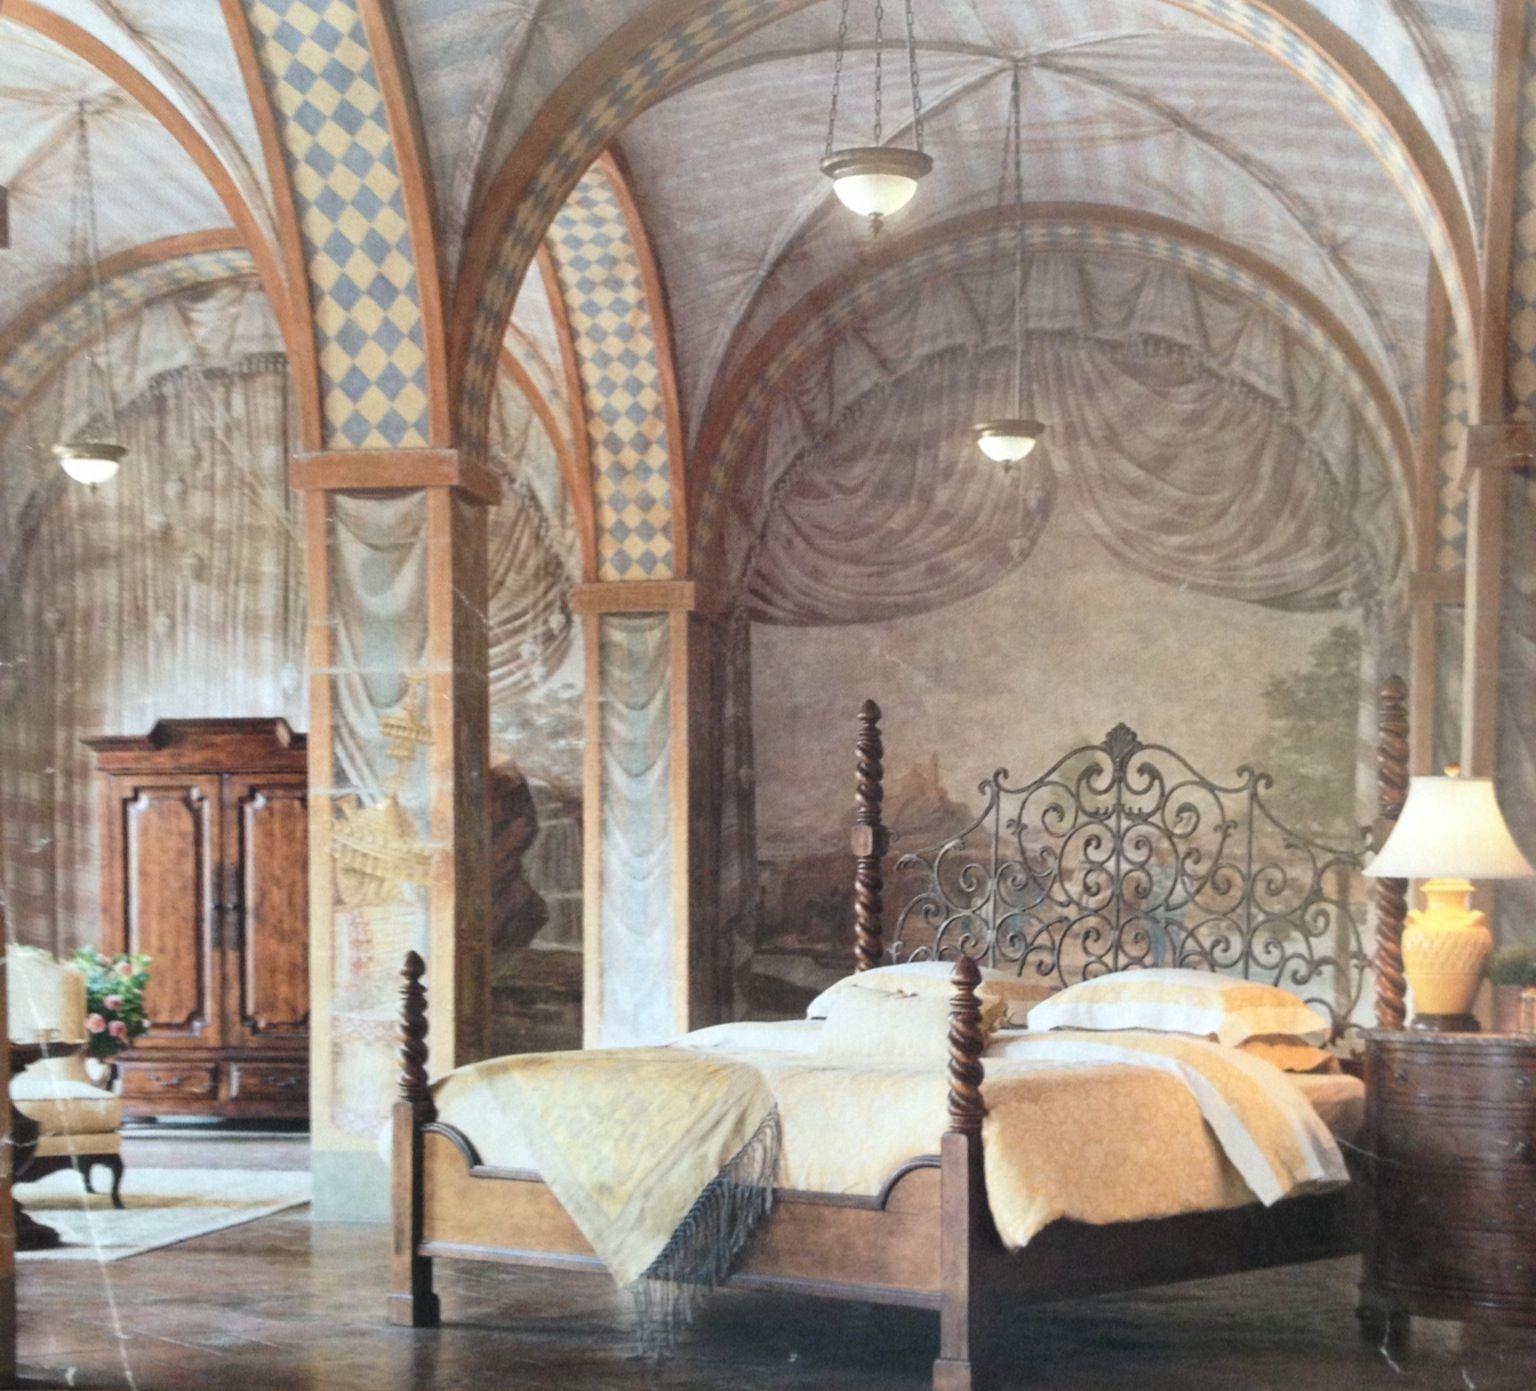 tuscany ways to decorate bedroom | Beautiful Tuscan bedroom. | Tuscan bedroom, Tuscan ...